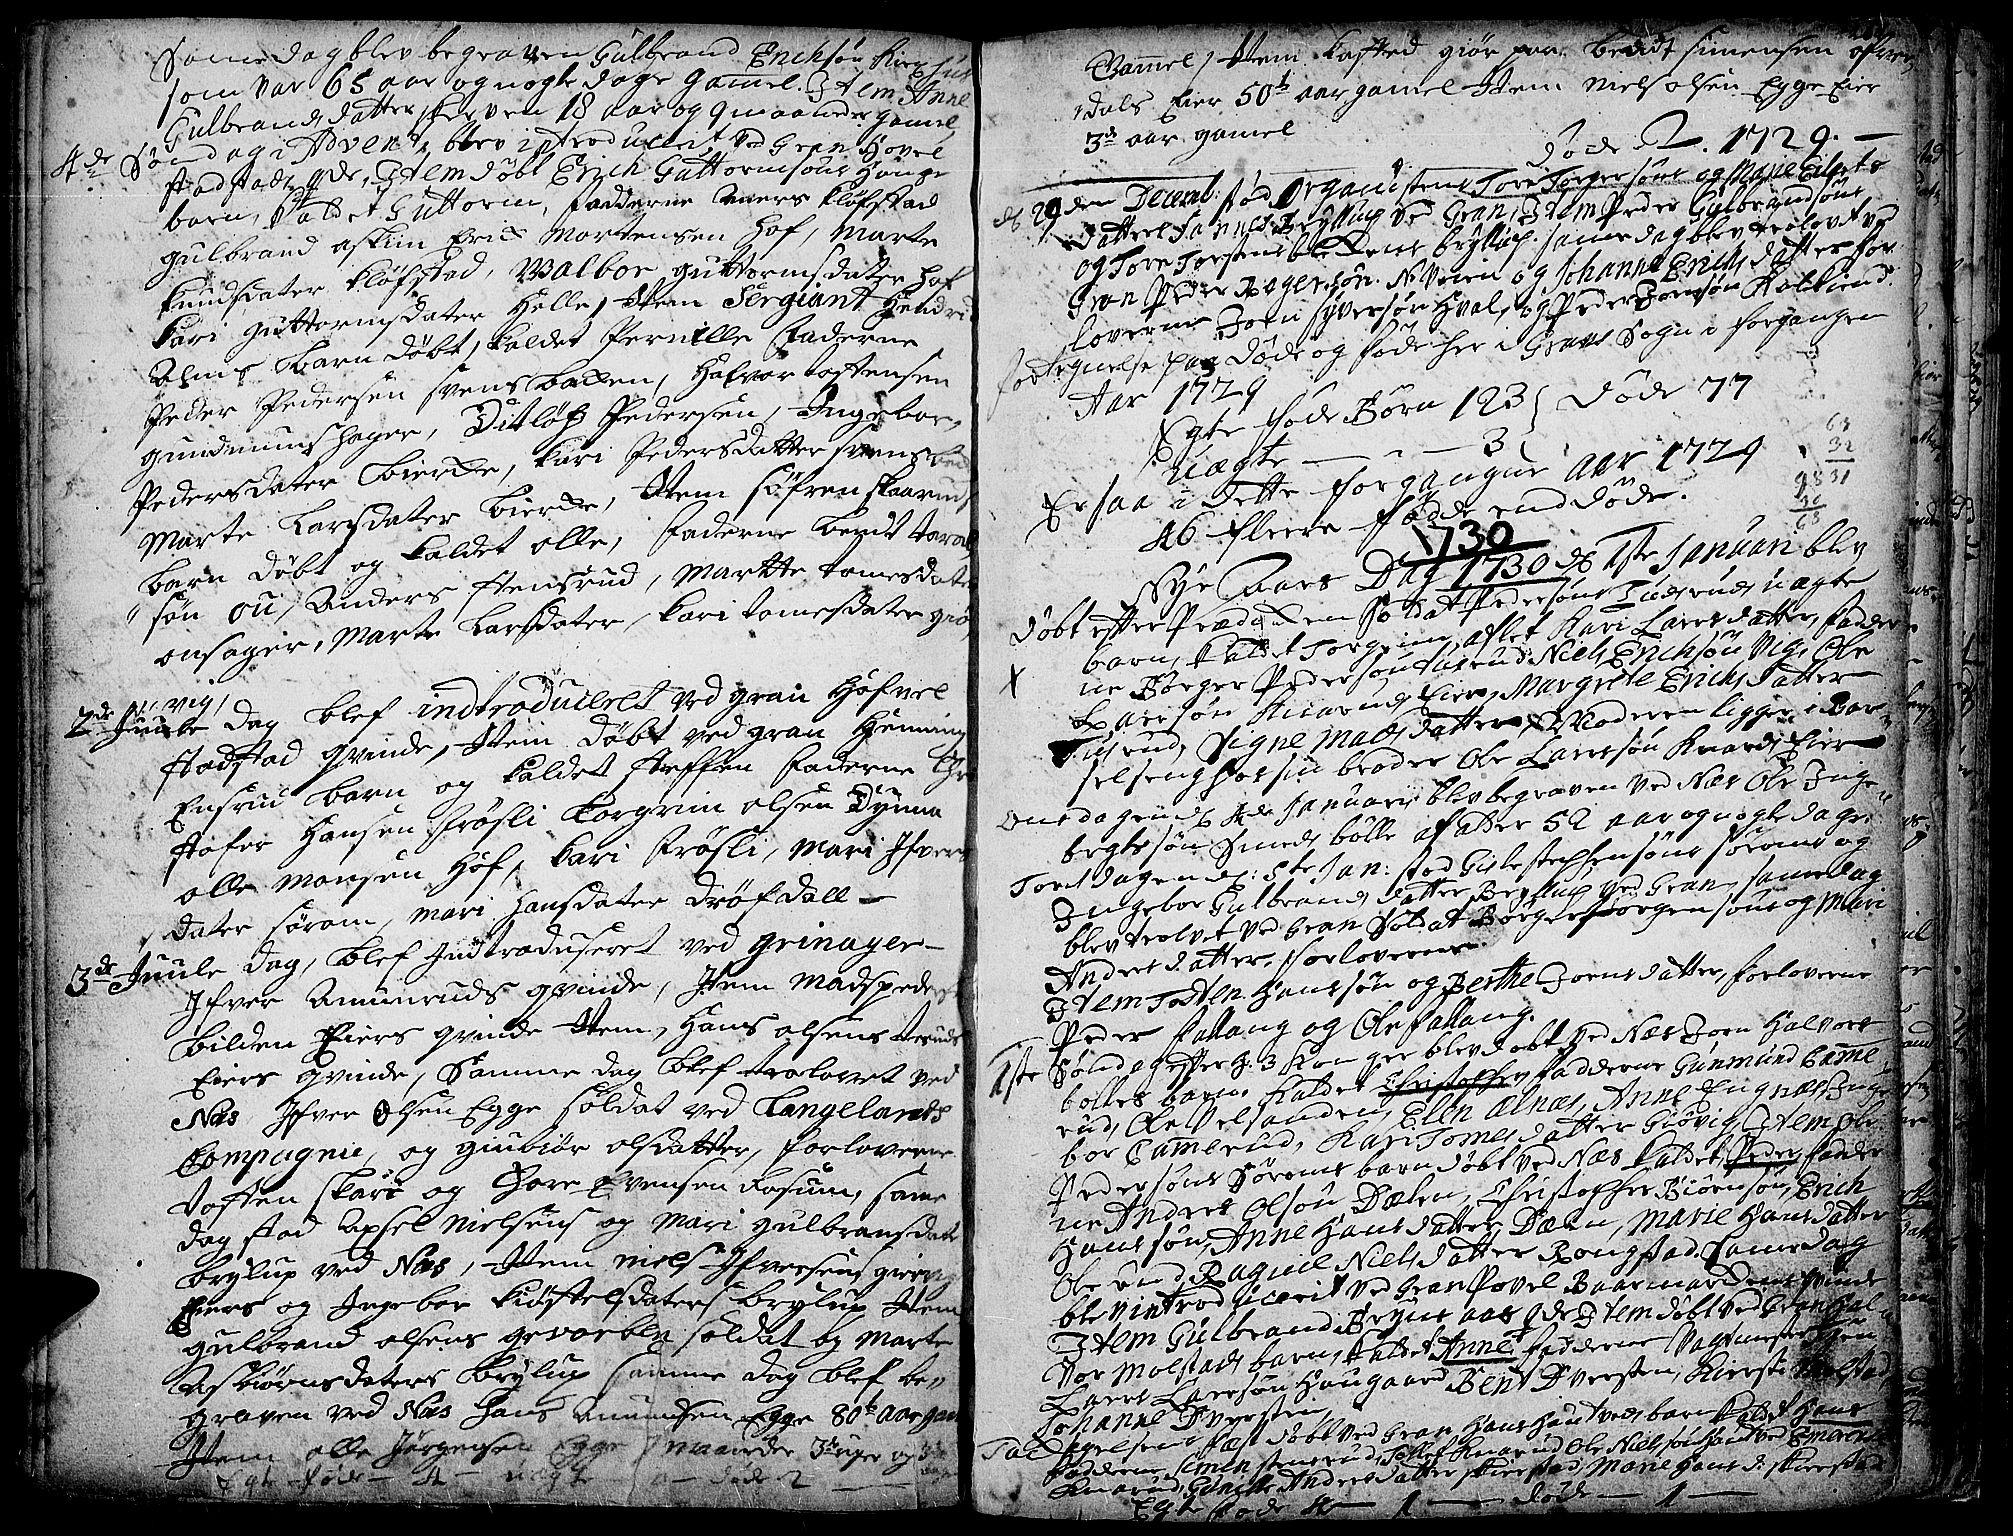 SAH, Gran prestekontor, Ministerialbok nr. 1, 1707-1731, s. 259